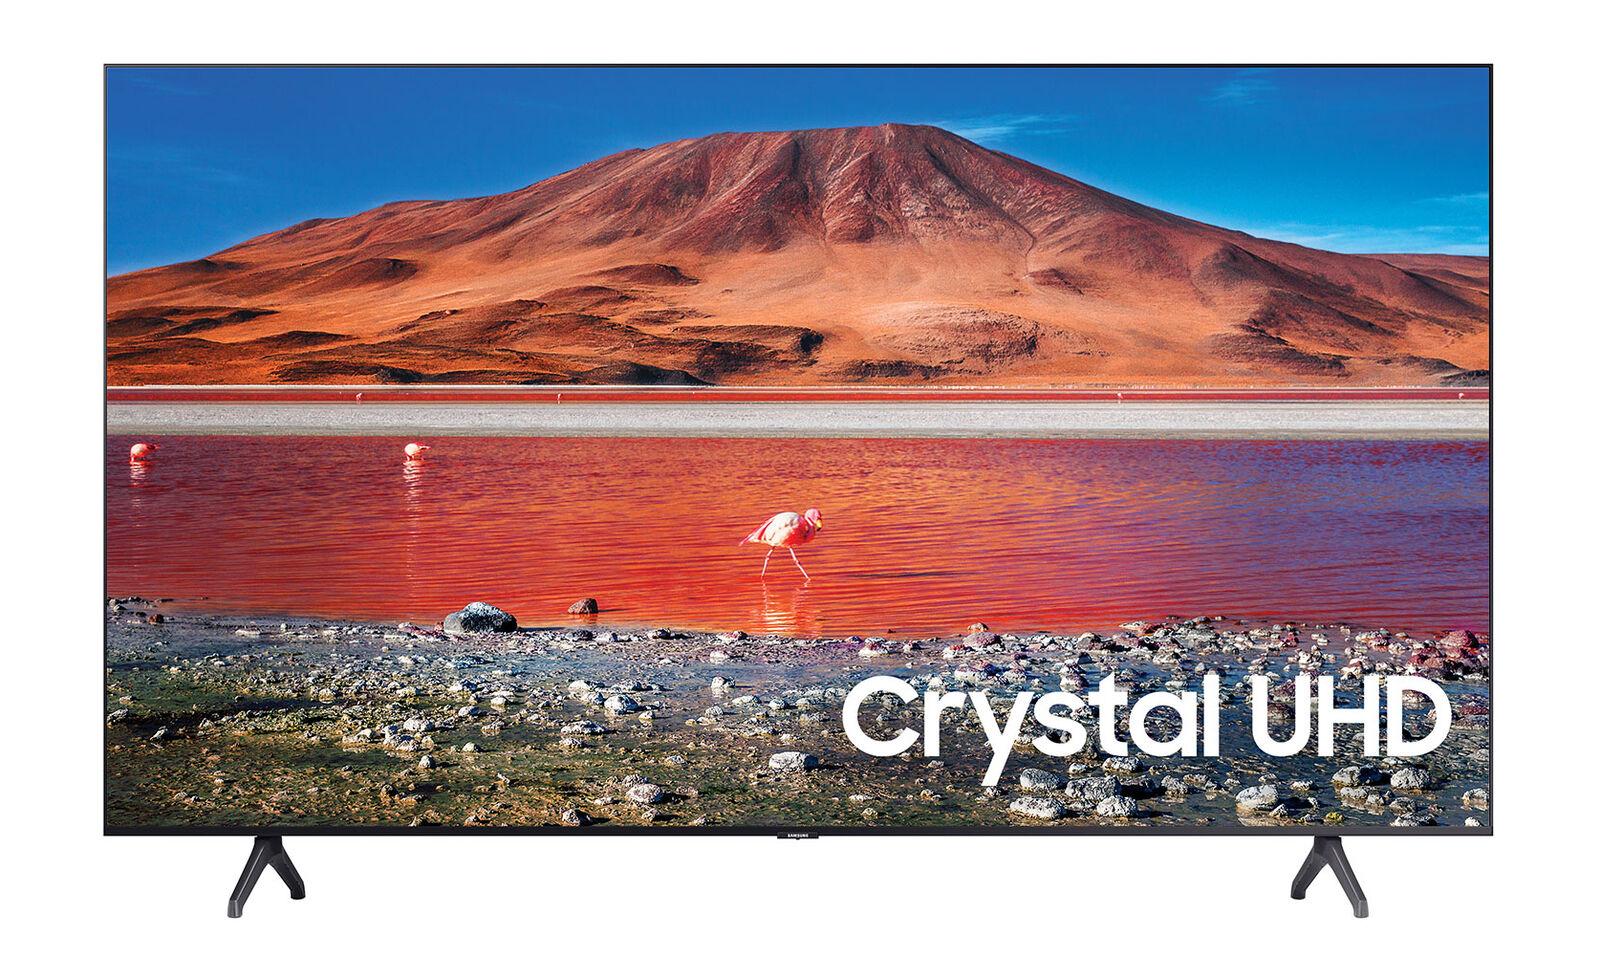 lockerq Samsung UN65TU7000FXZA 65 4K LCD Smart TV - Titan Gray